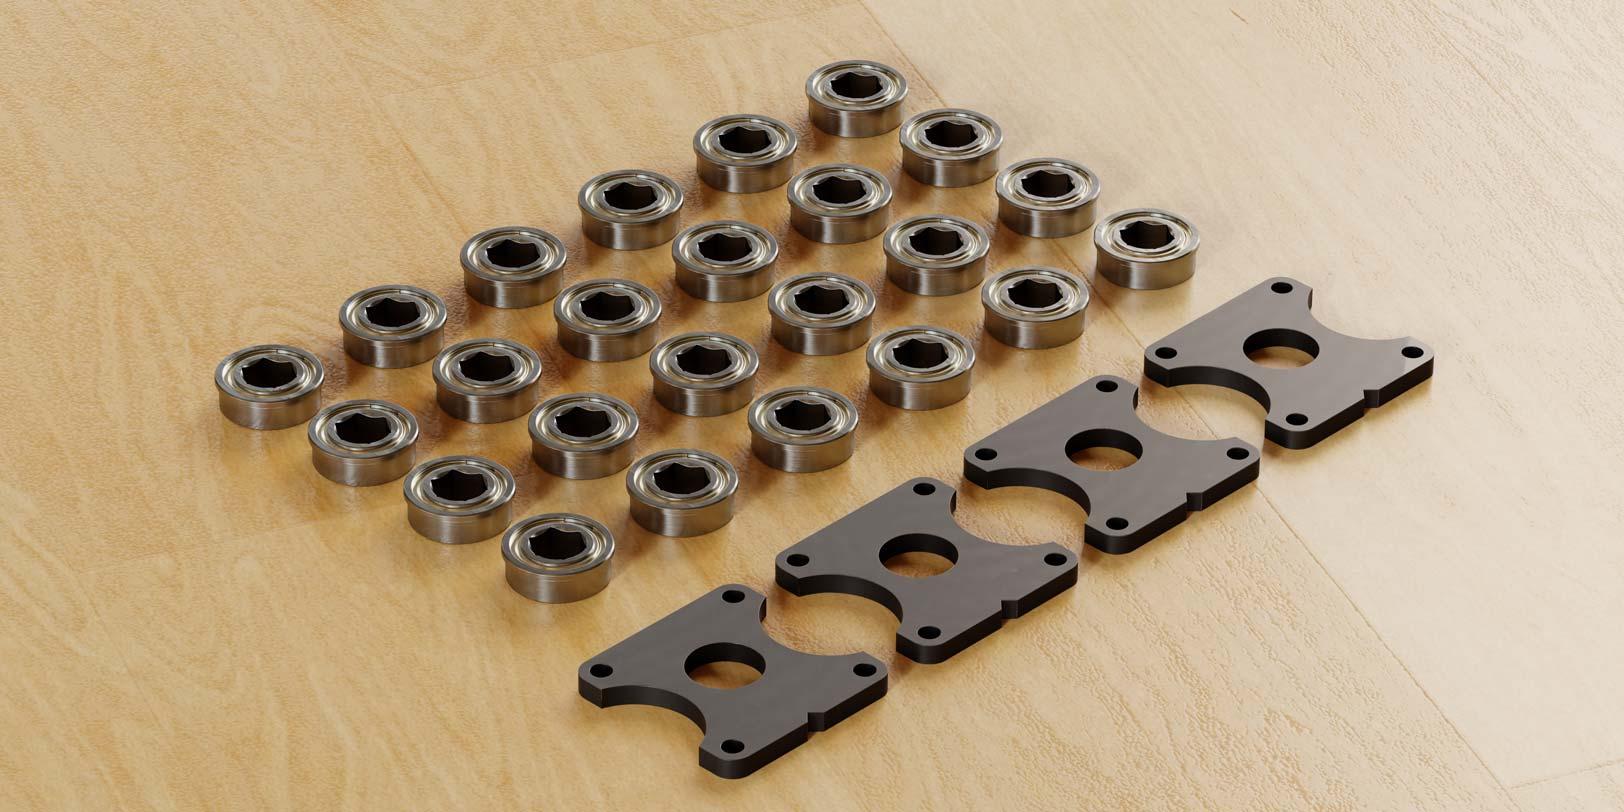 8mm-21-kit-bearings-1624px.jpg